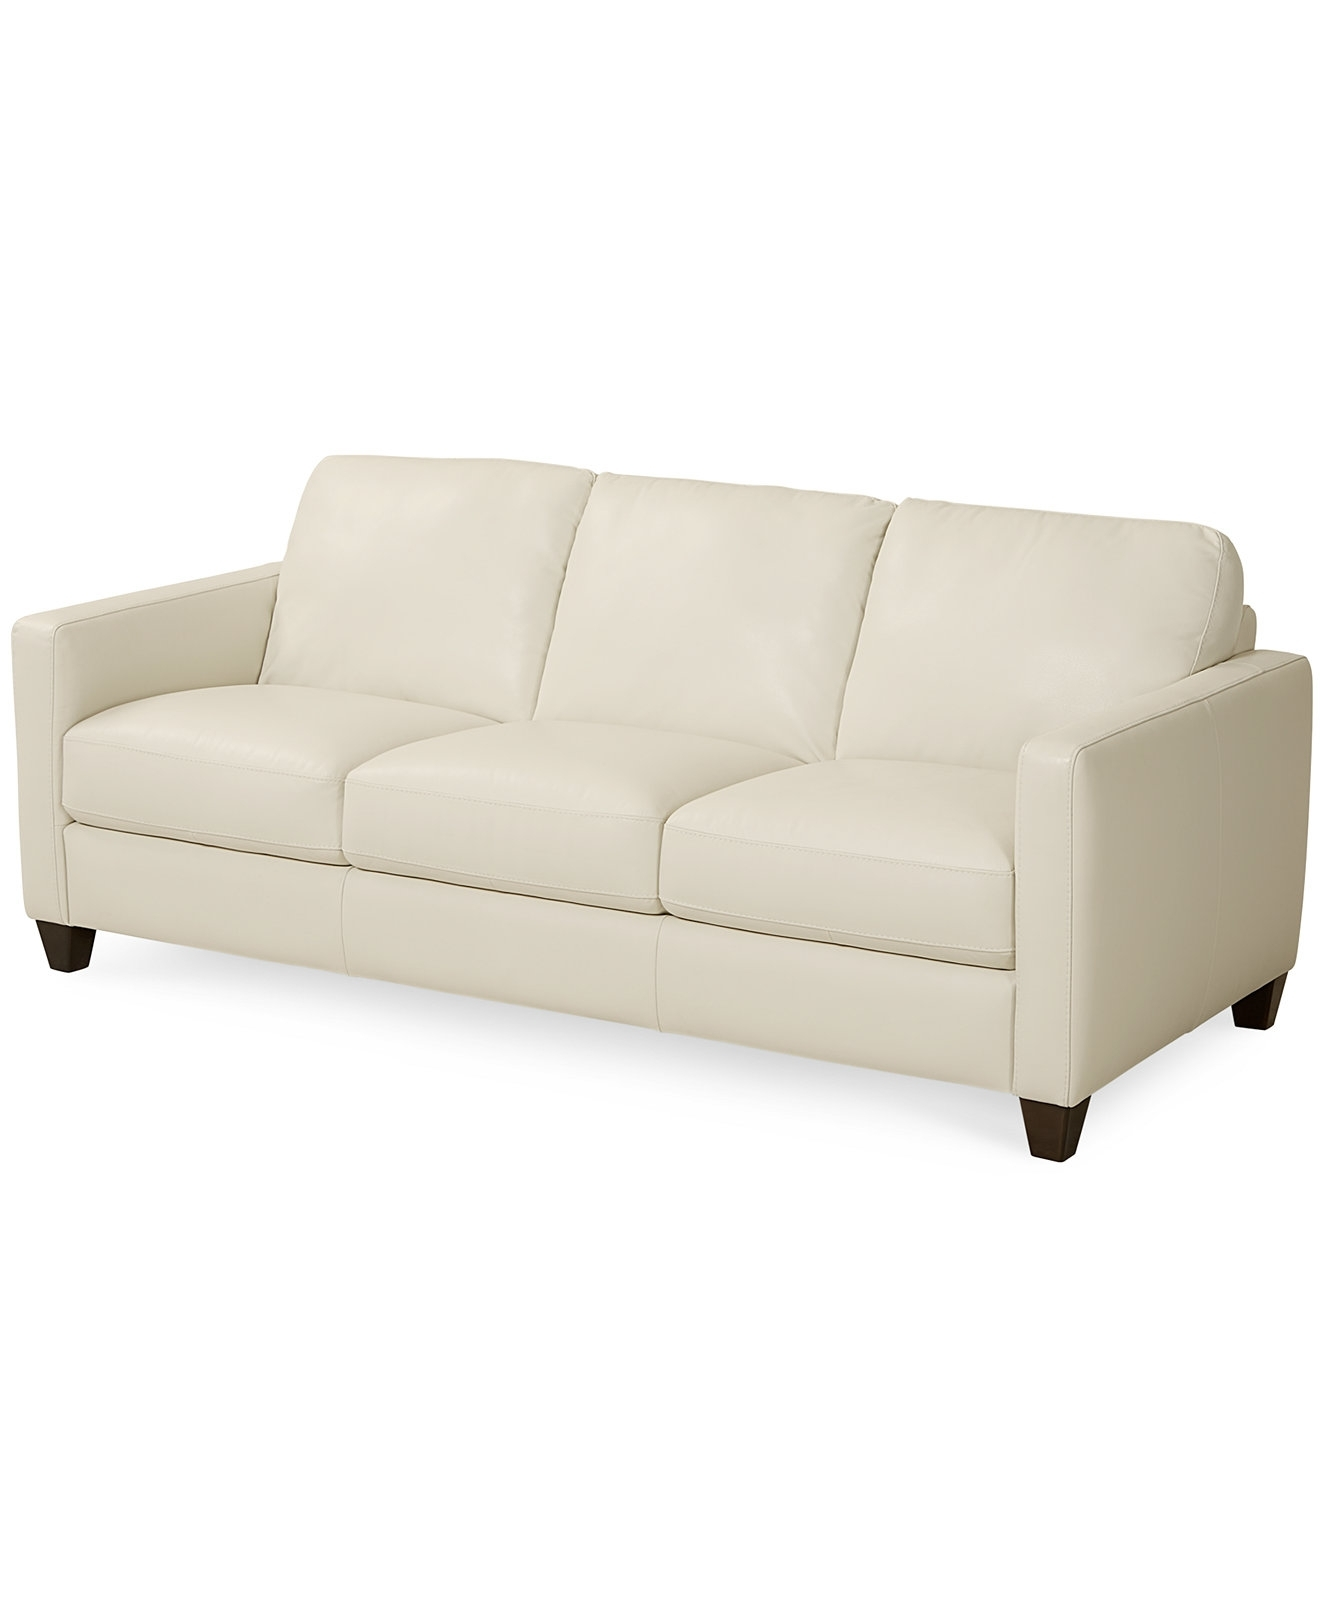 Most Up To Date Macys Leather Sofa – Mforum Pertaining To Macys Sofas (View 17 of 20)